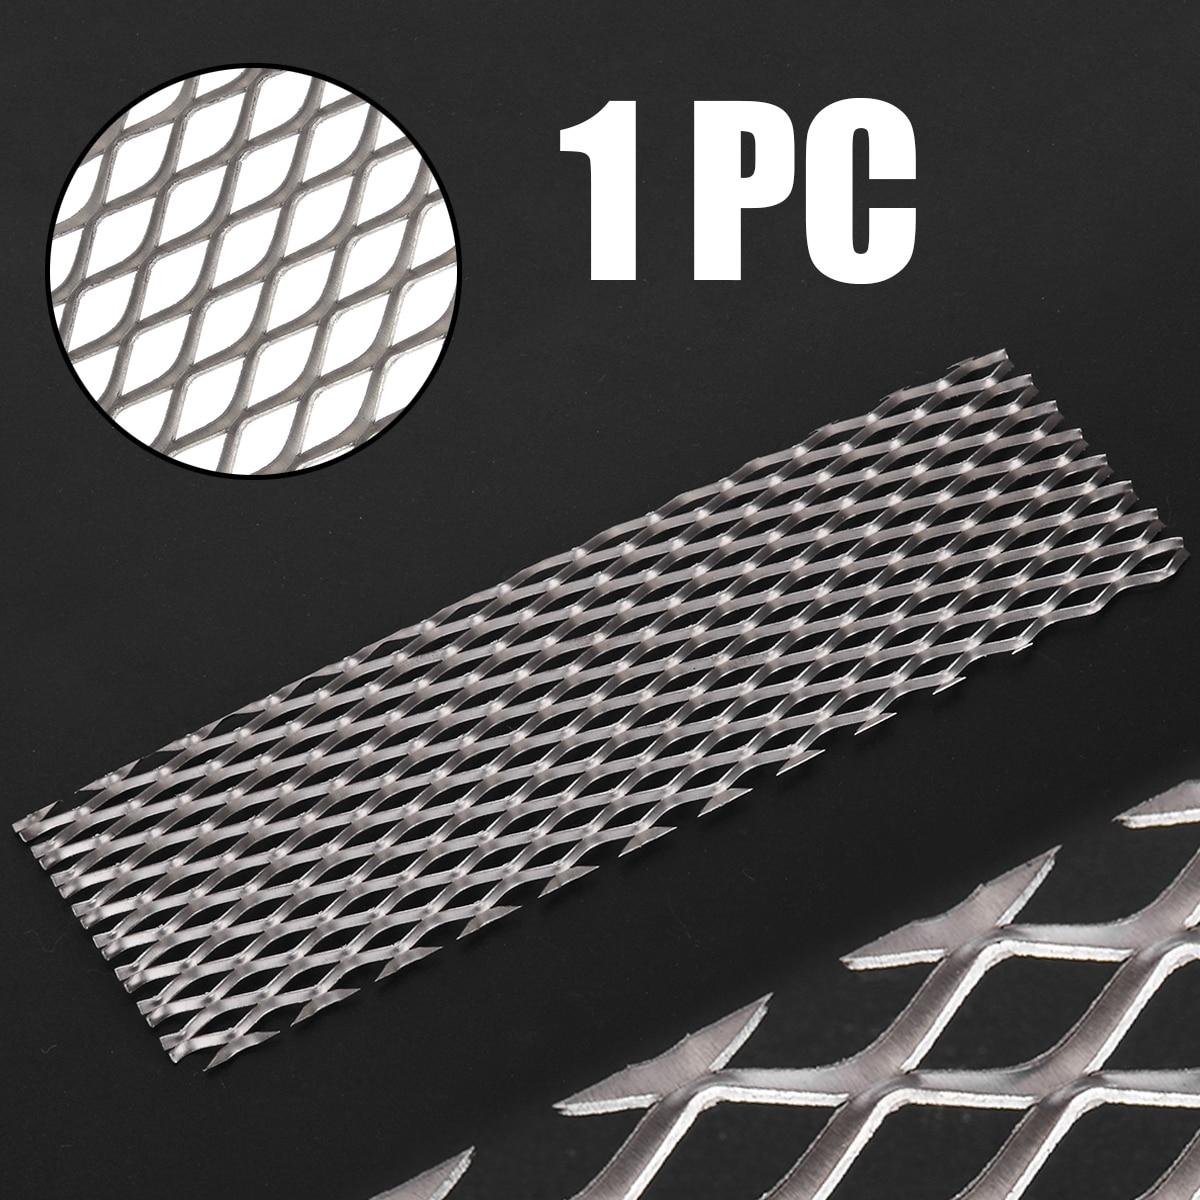 1pc Rectangle Titanium Sheet 50mm*165mm Recycled Metal Titanium Mesh Electrode Heat Corrosion Resistance for Electrolysis недорого